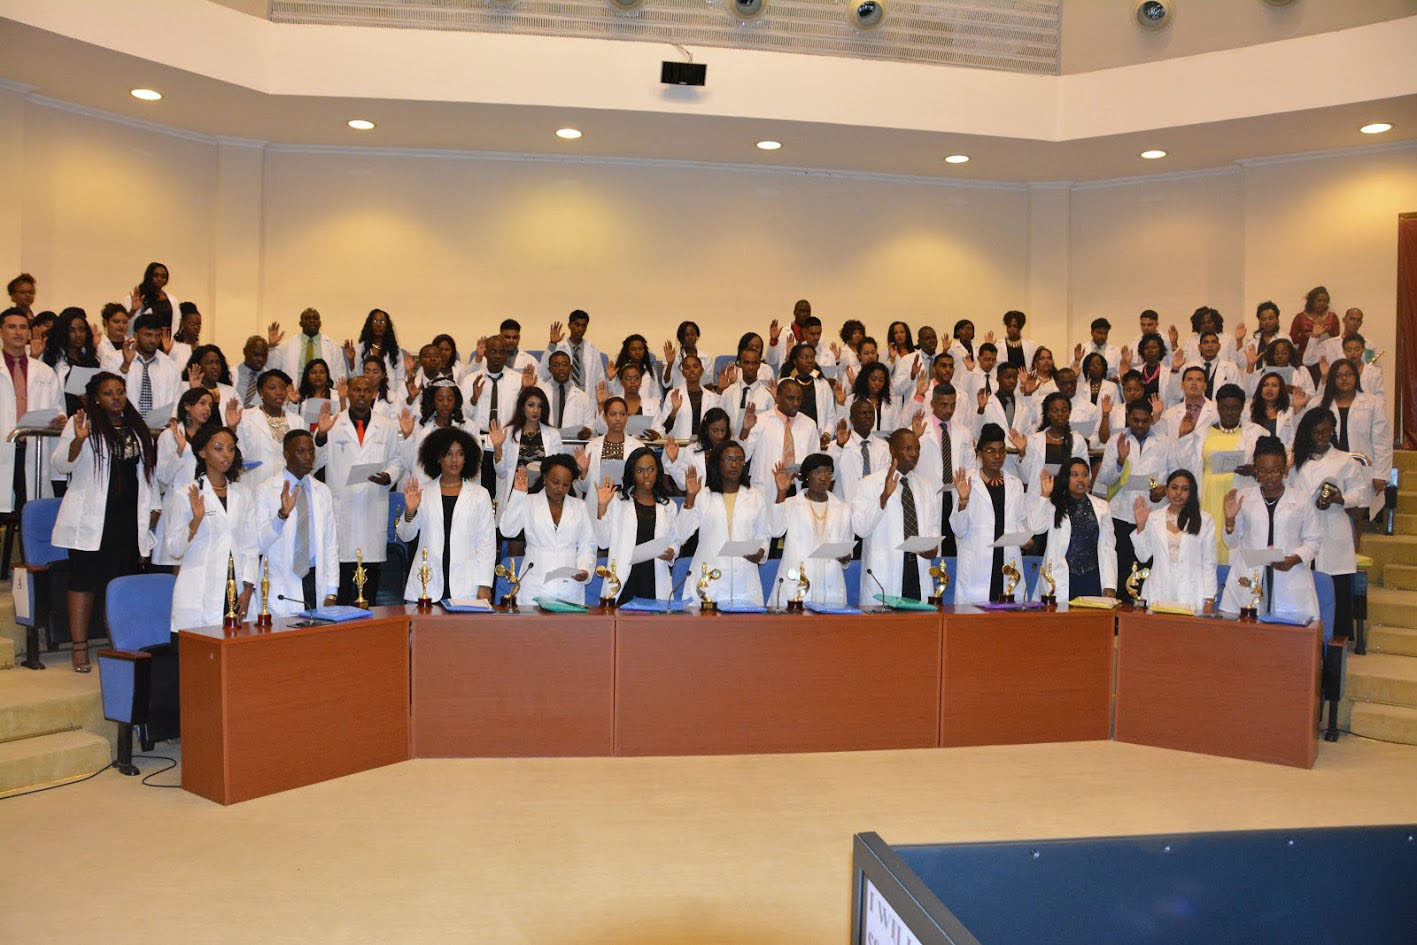 Eighty-six Cuba-trained doctors take the oath – Stabroek News